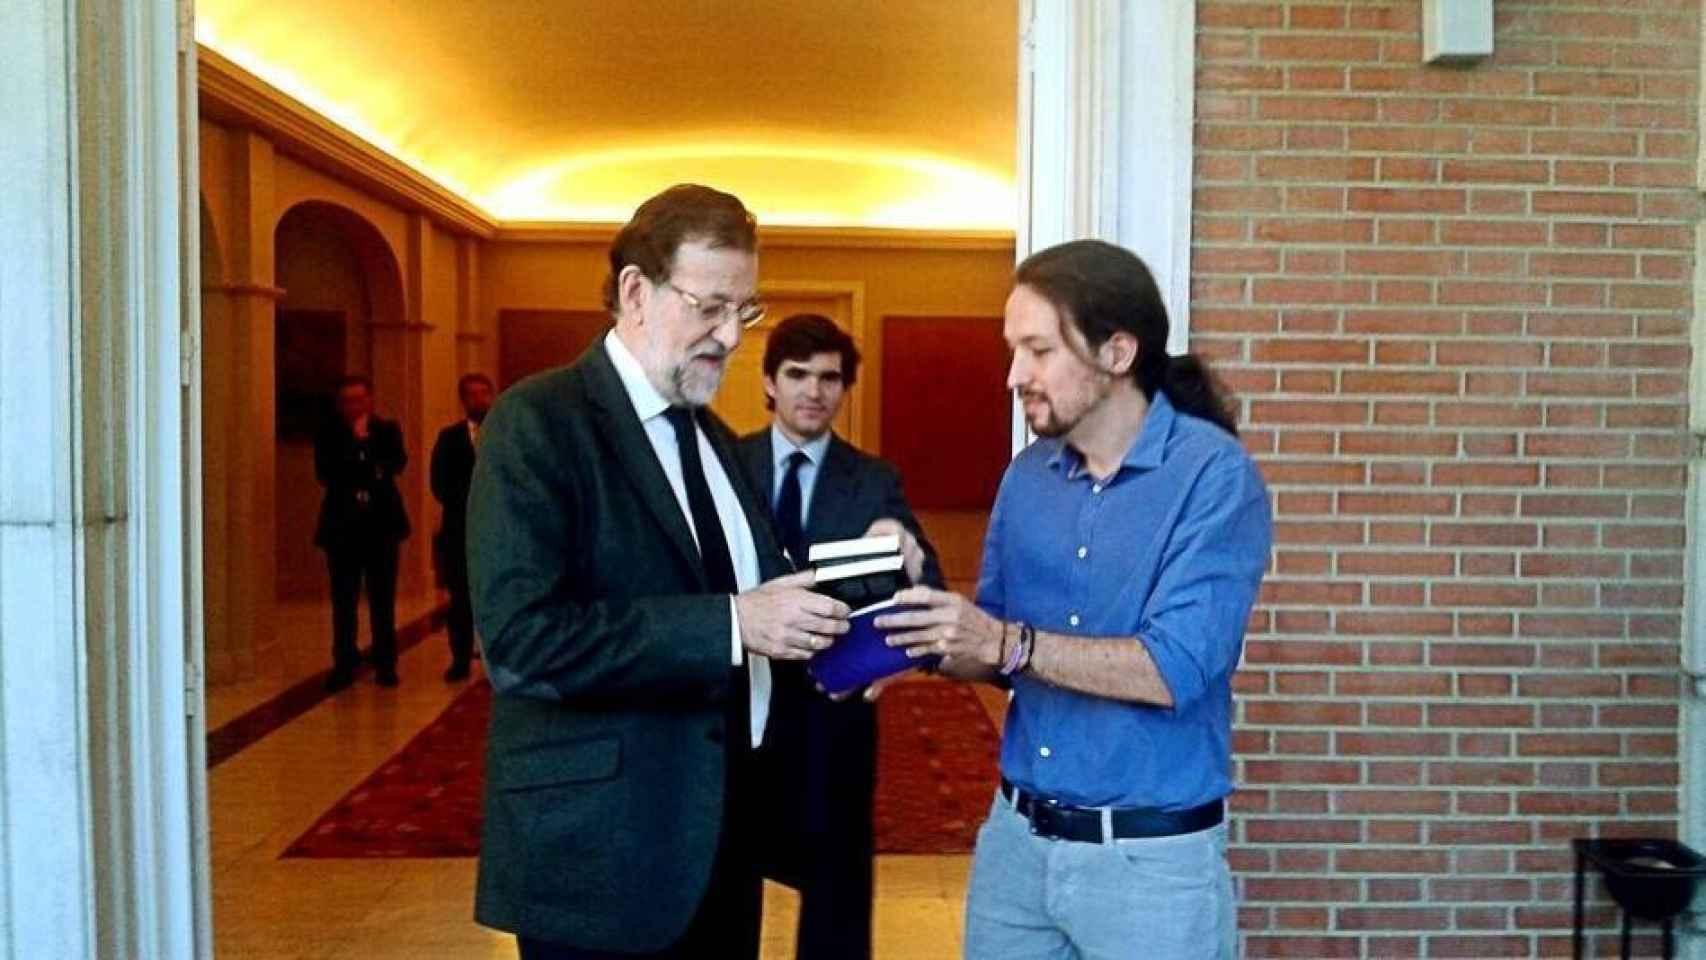 Pablo Iglesias regala un libro a Mariano Rajoy.